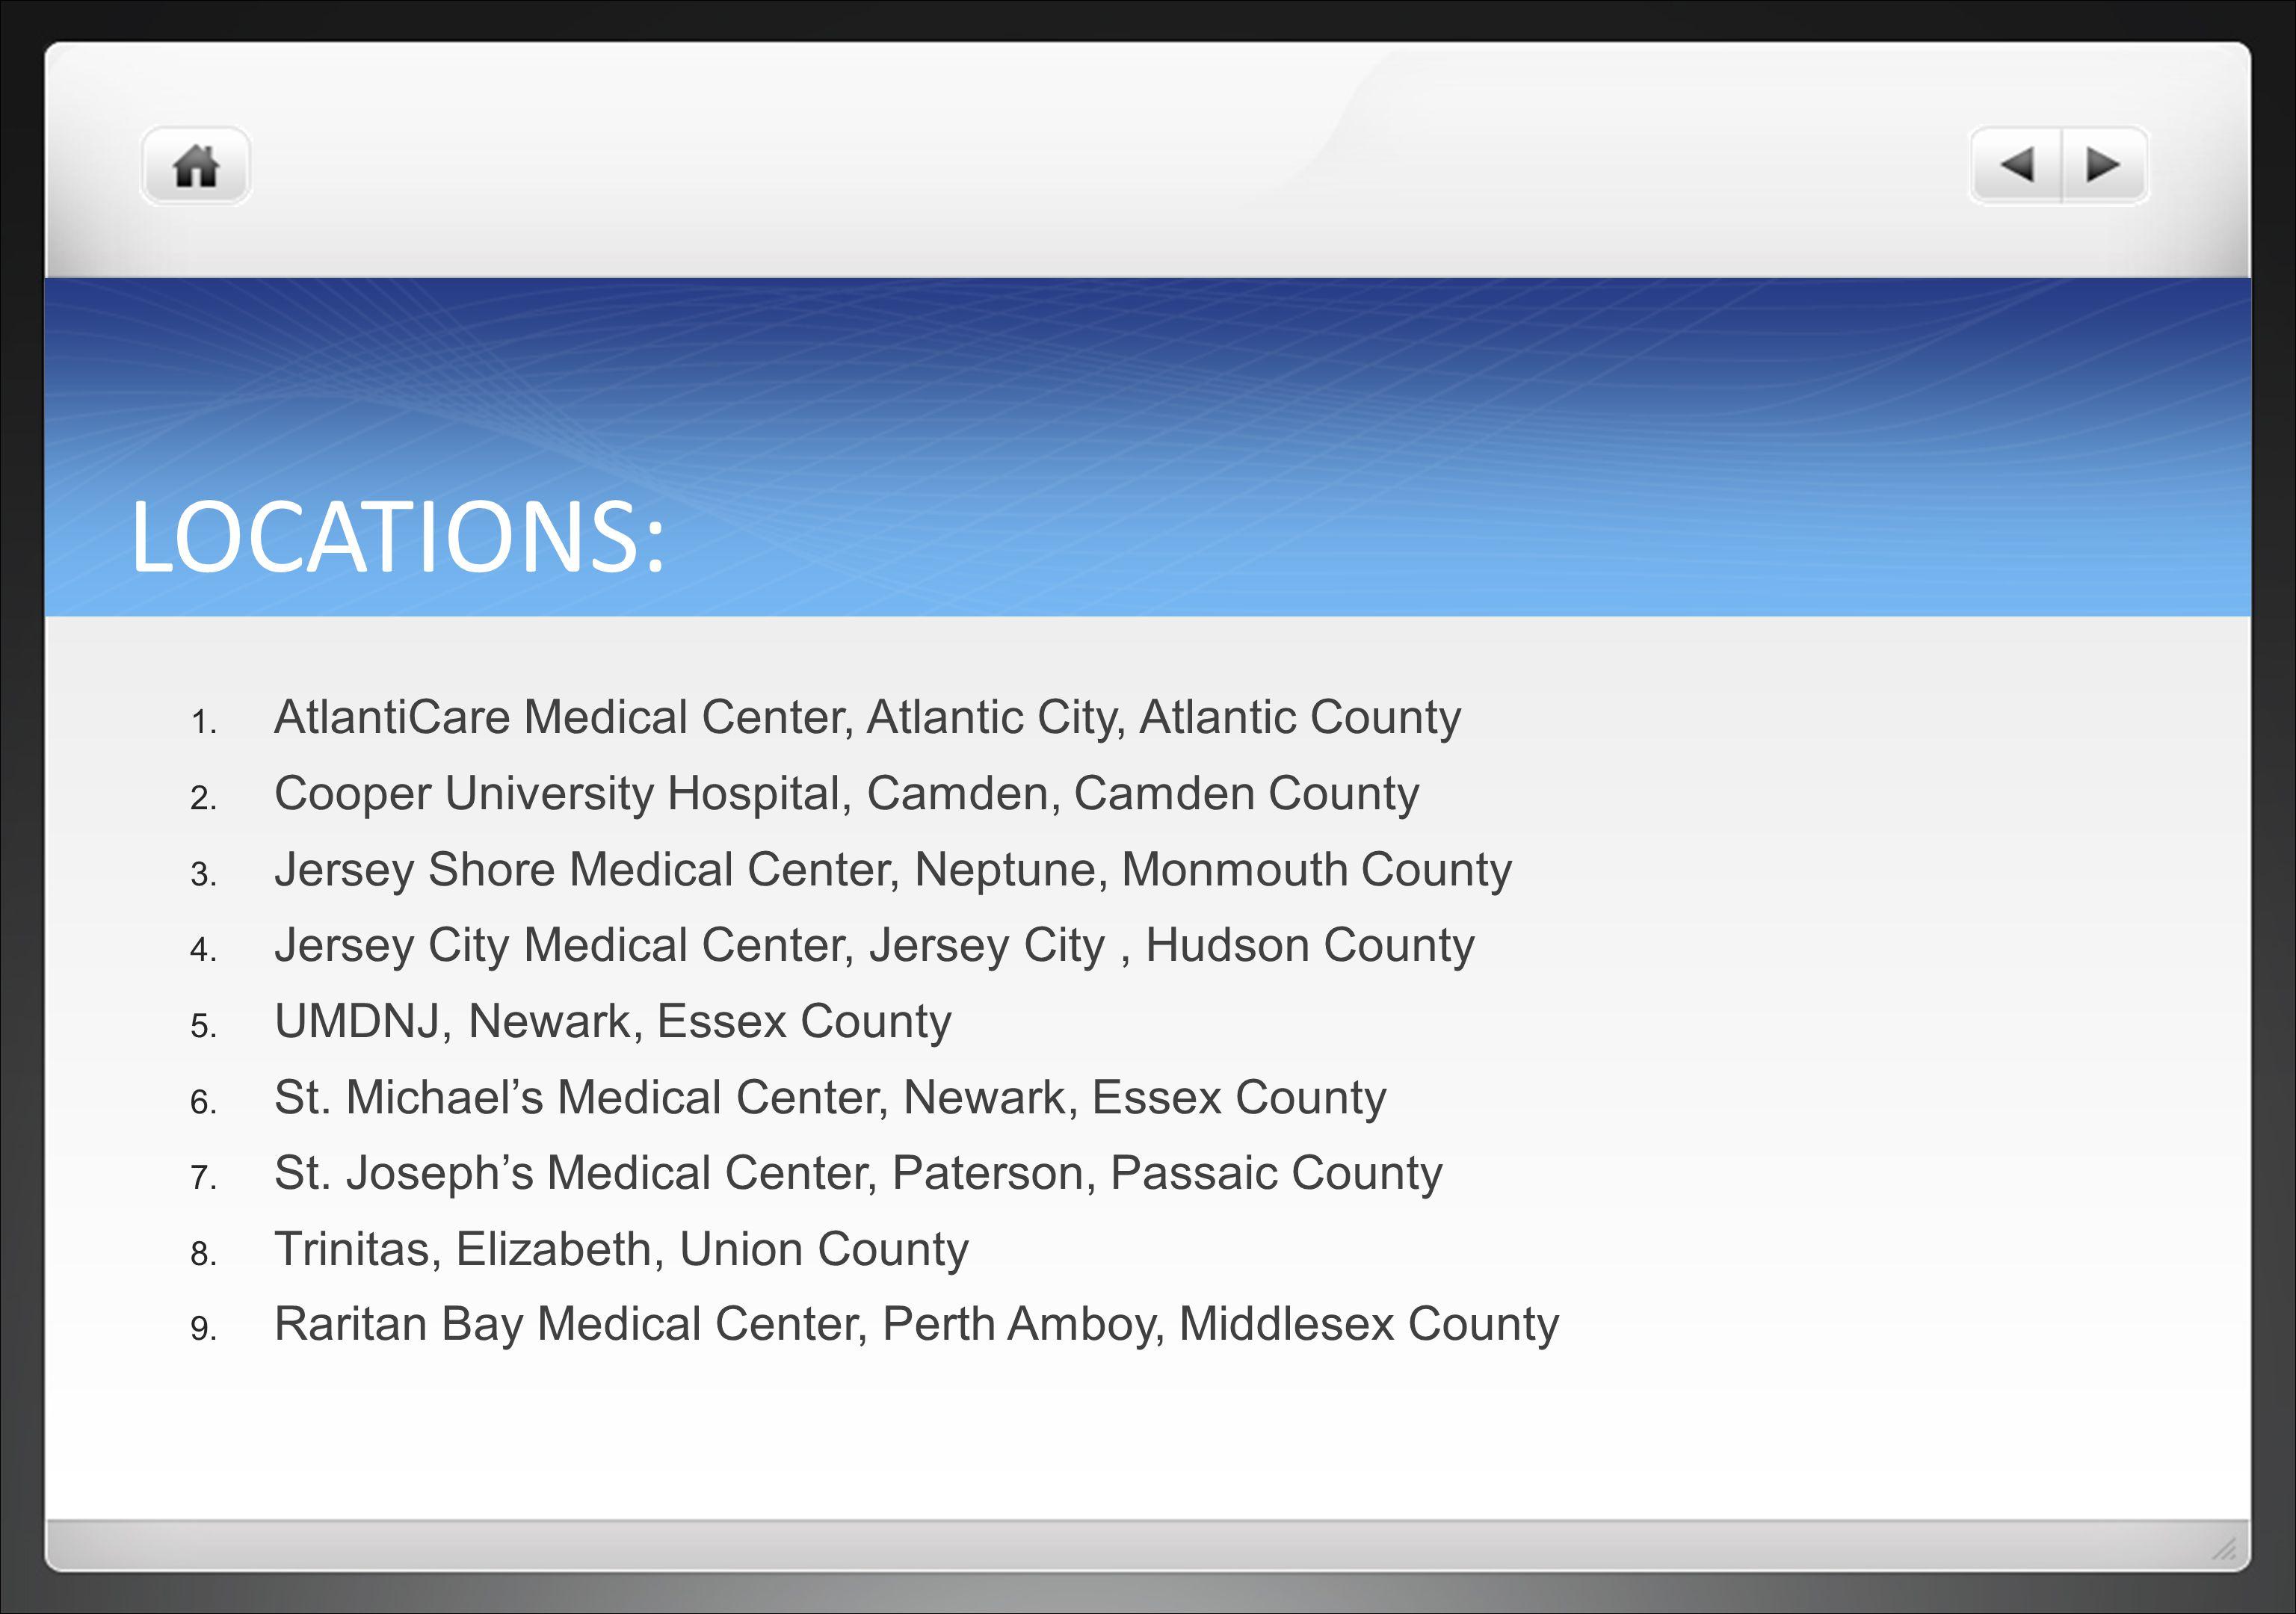 LOCATIONS: AtlantiCare Medical Center, Atlantic City, Atlantic County